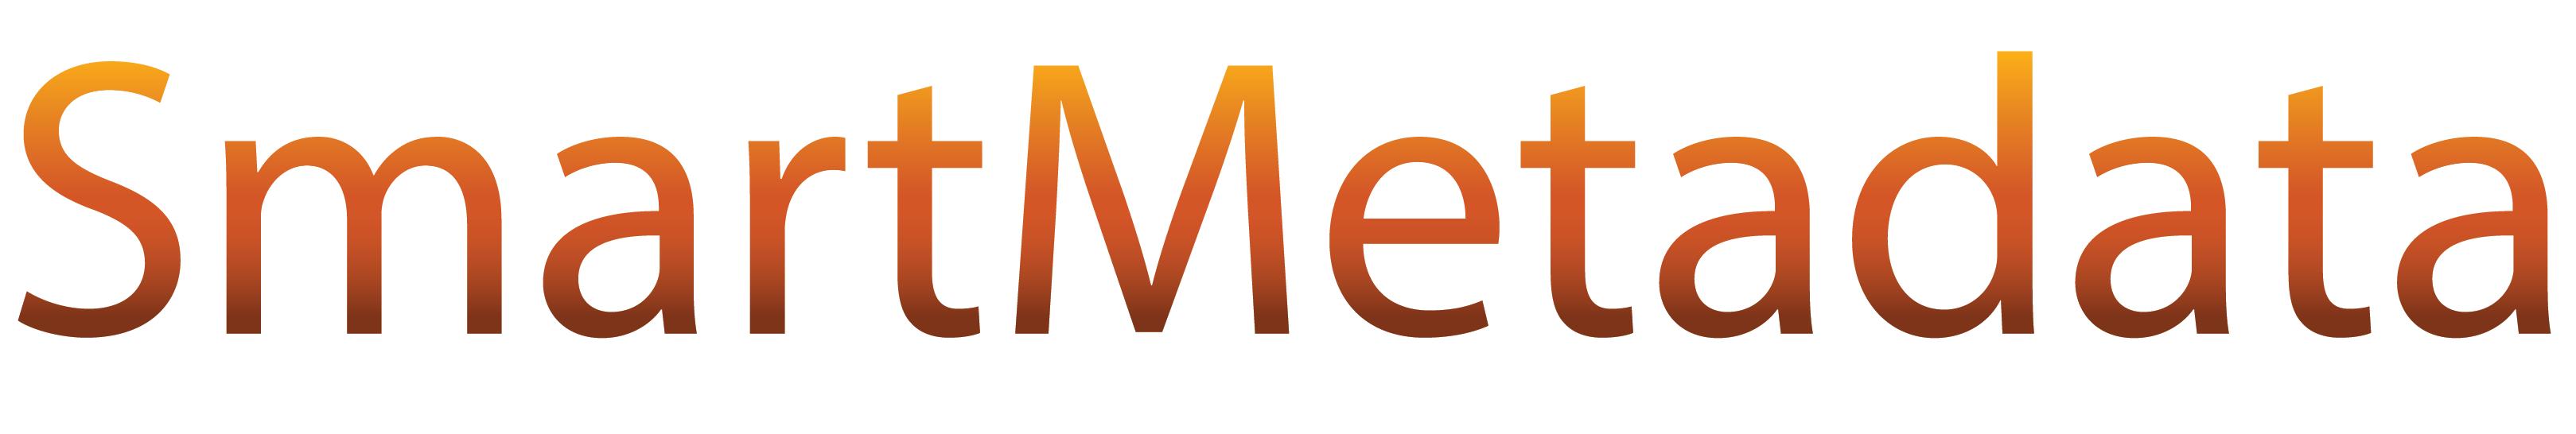 SmartMetadata logo